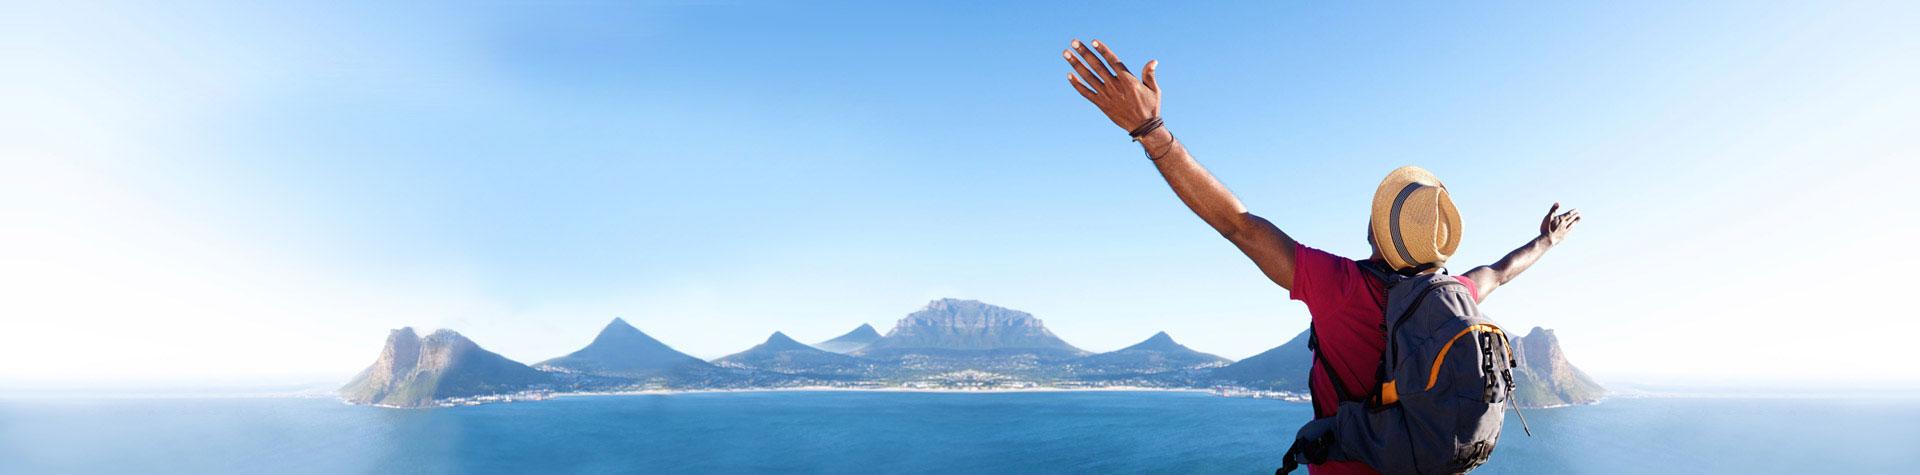 Pertama Kali Solo Traveling? Ini Tips Agar Tetap Aman dan Gak Kesepian